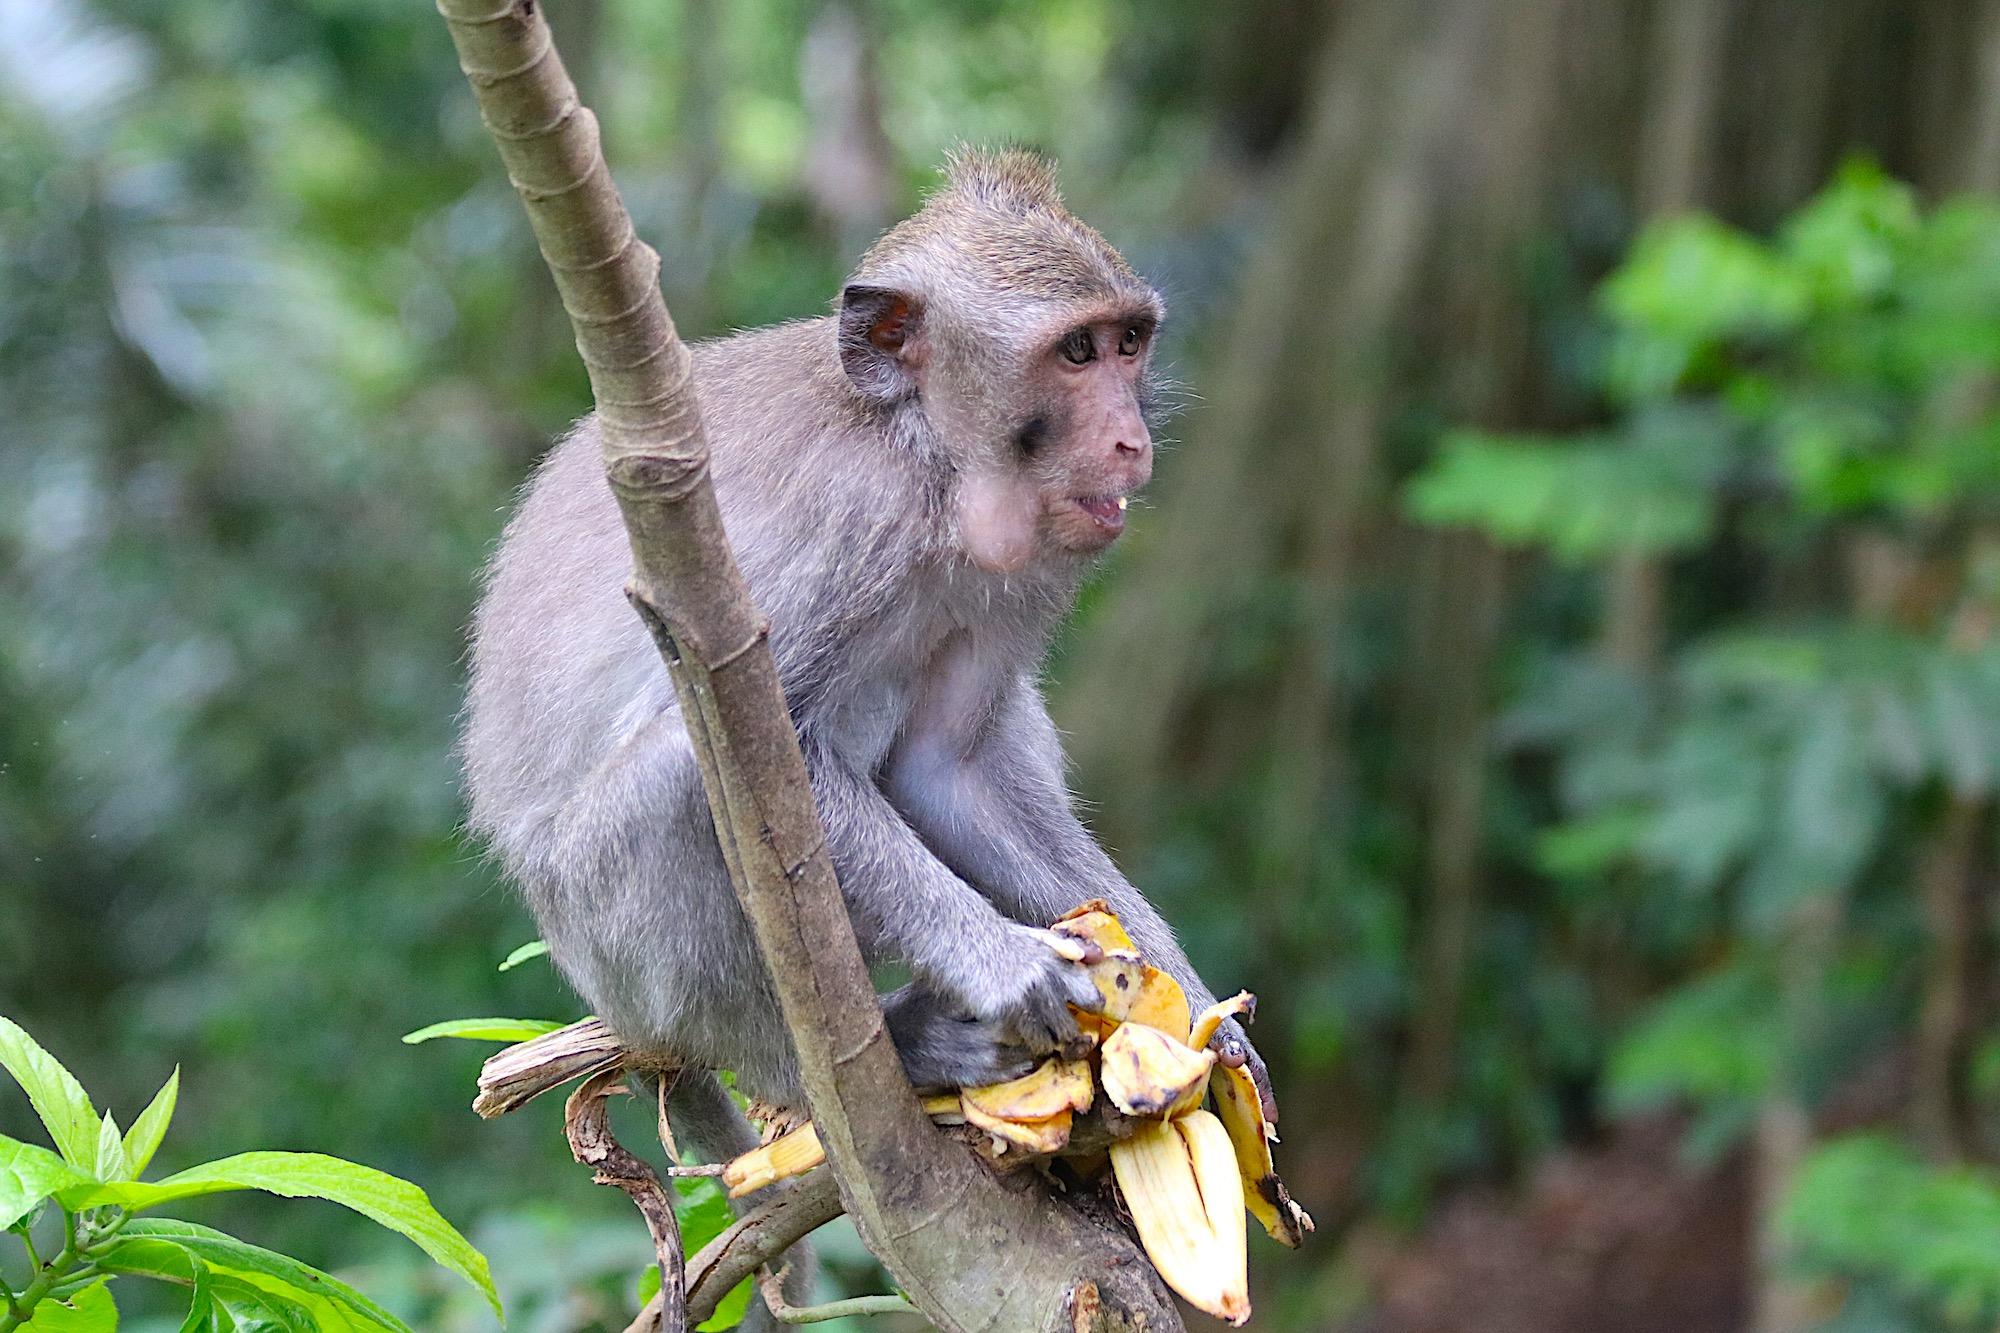 macaque-banana-3.jpg